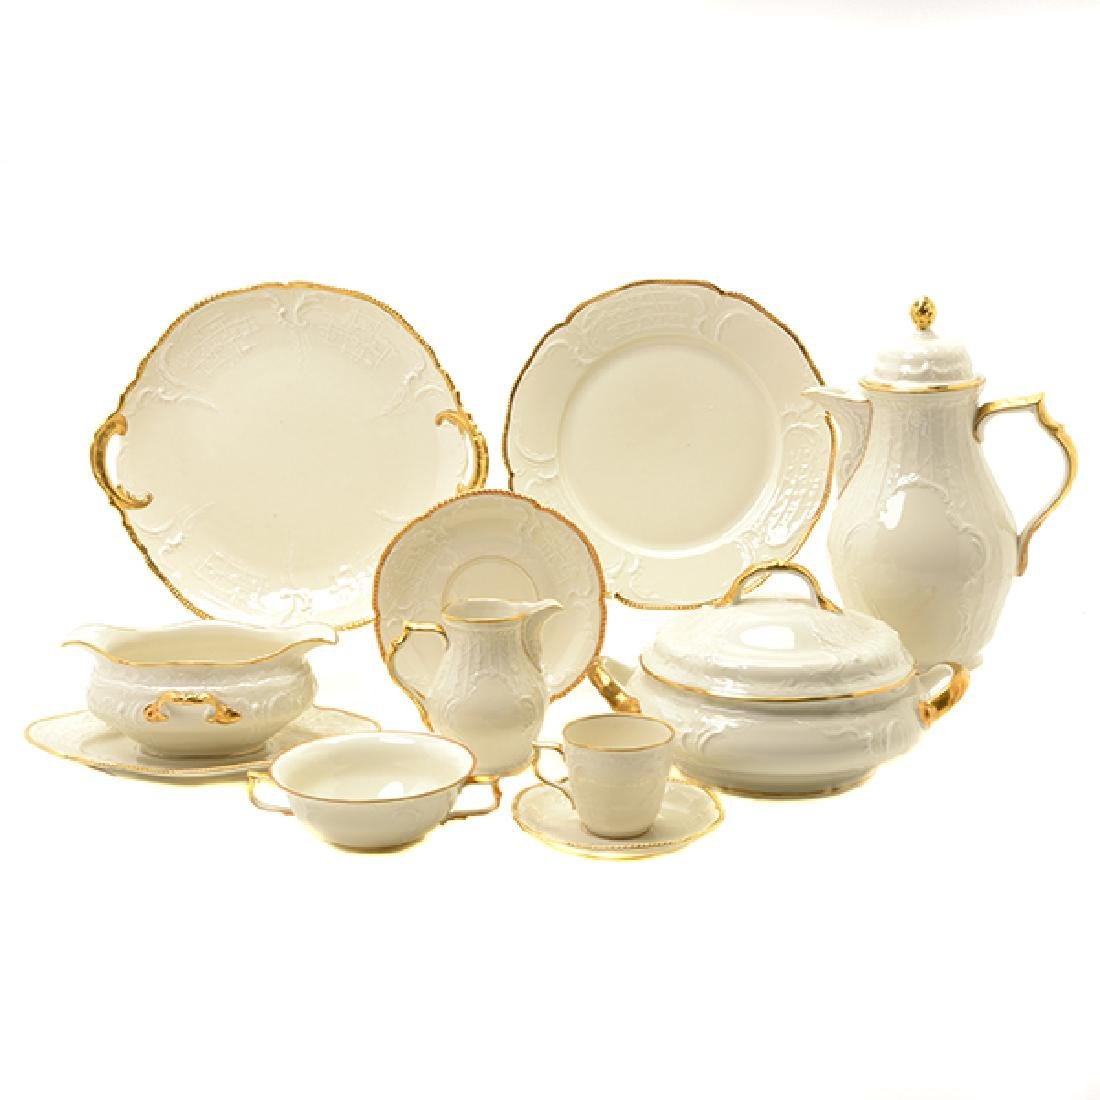 Rosenthal Sans Souci Porcelain Dinner Service